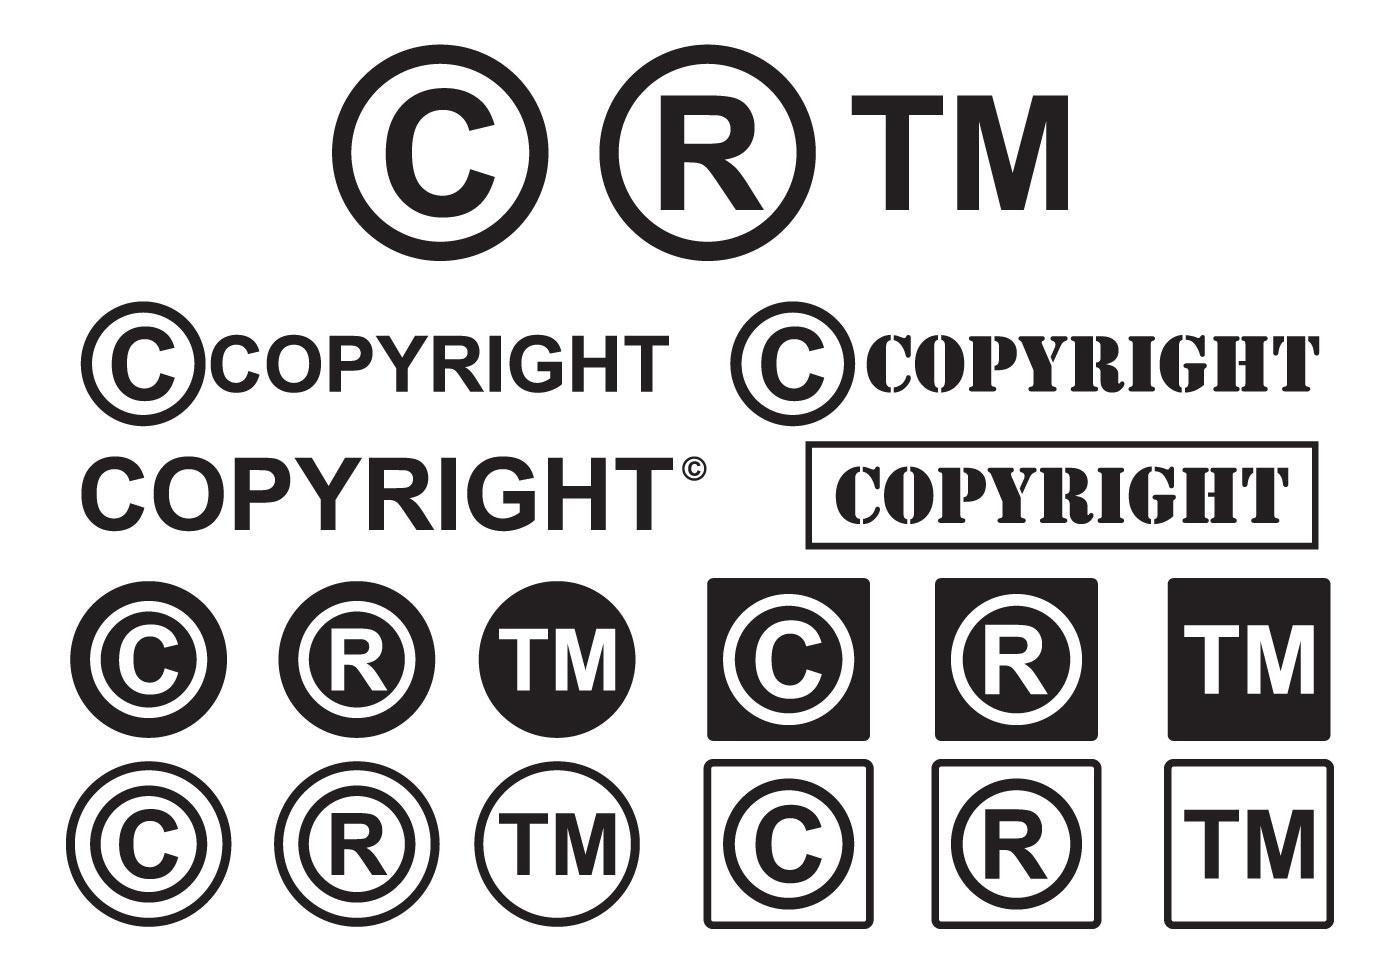 Set of minimal copyright symbol vectors download free vector art set of minimal copyright symbol vectors download free vector art stock graphics images buycottarizona